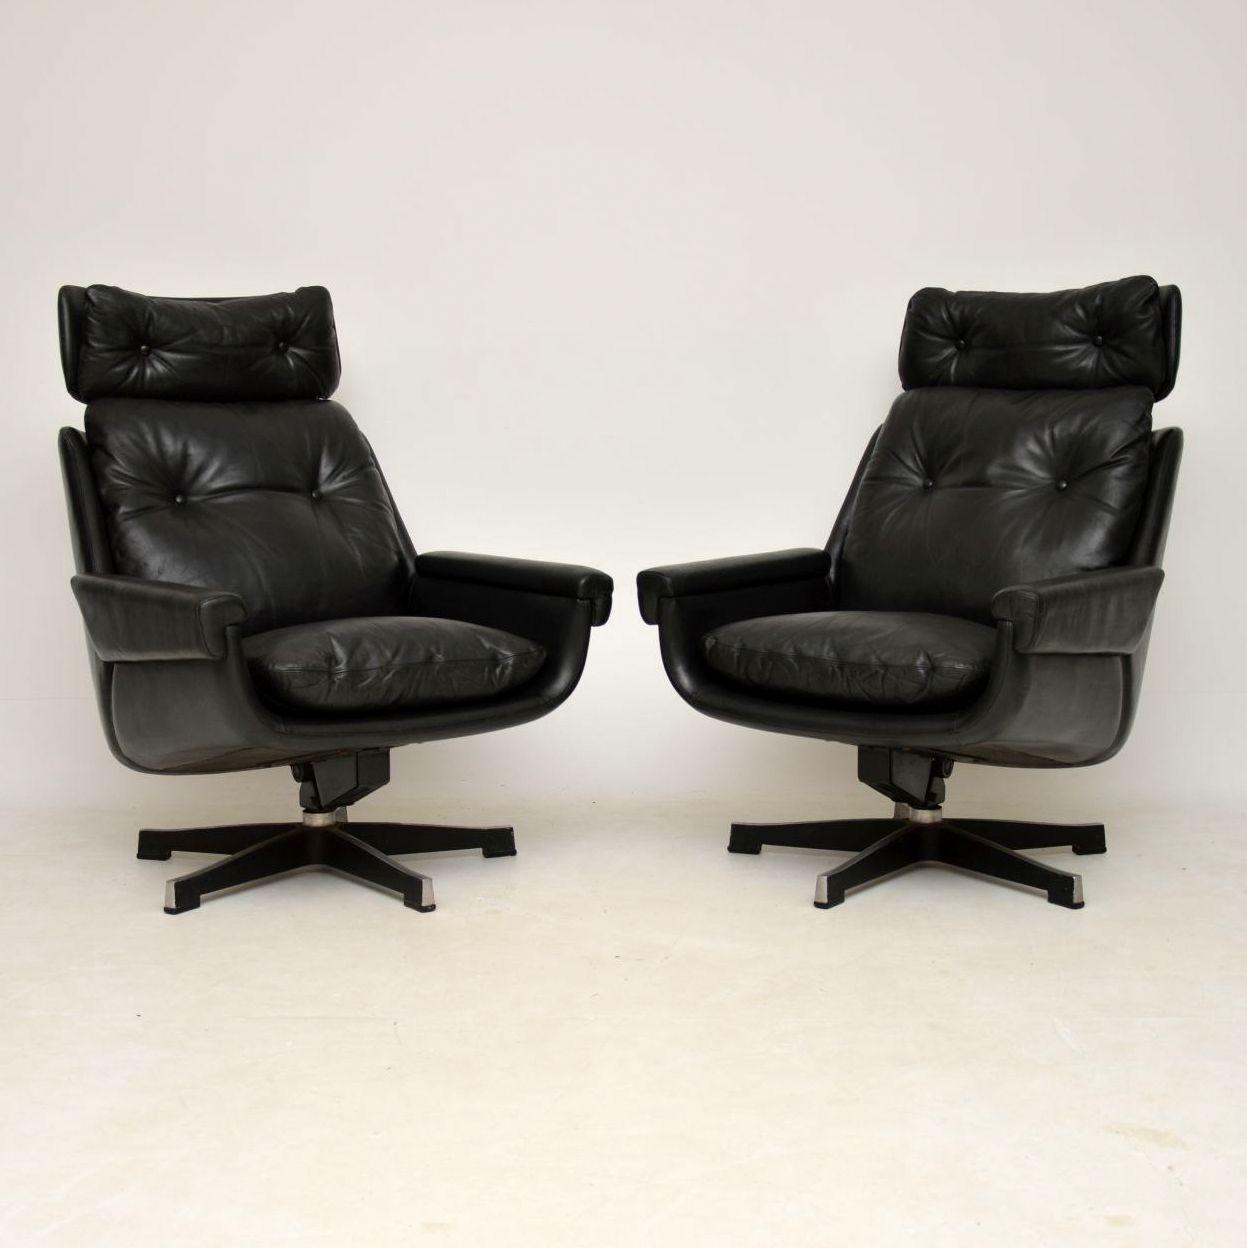 pair of vintage leather retro swivel rocking armchairs peem